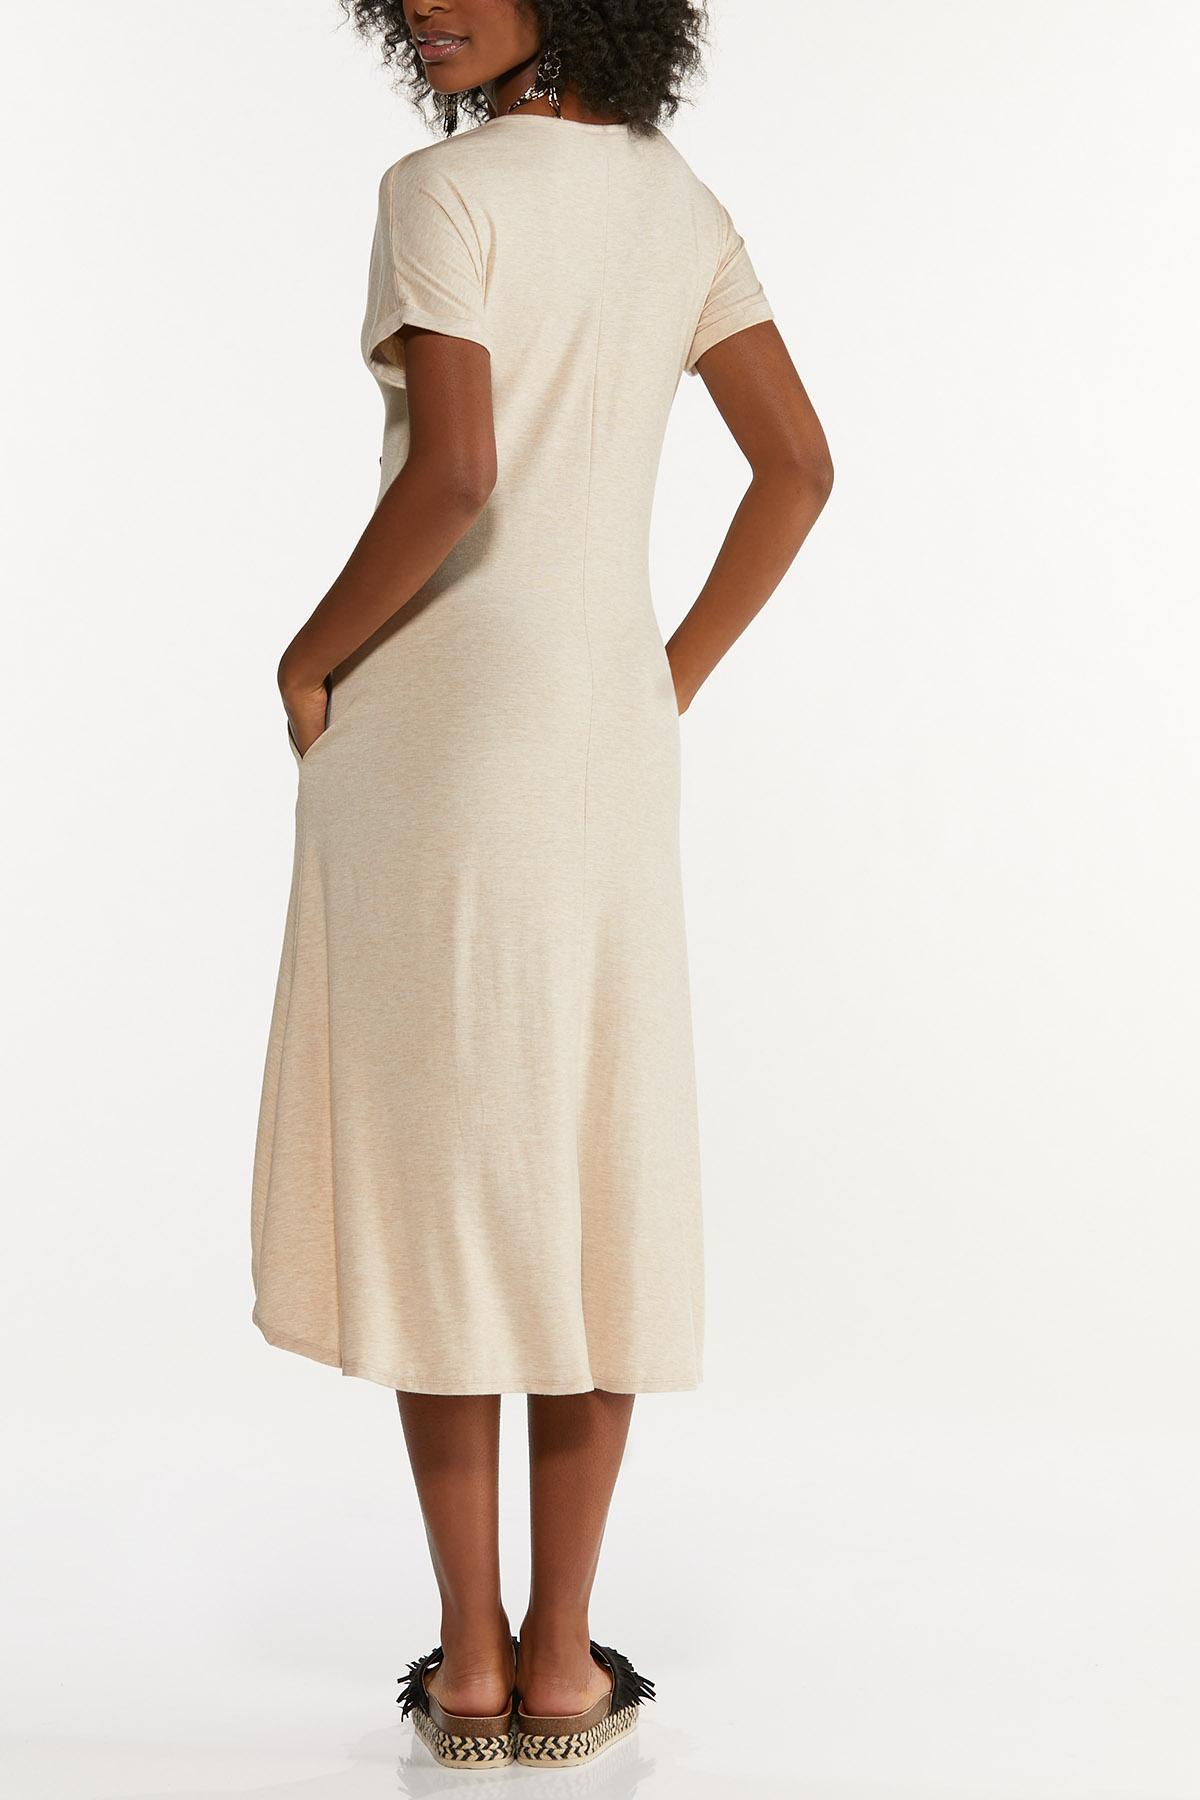 Let The Good Times Roll Shirt Dress (Item #44619453)